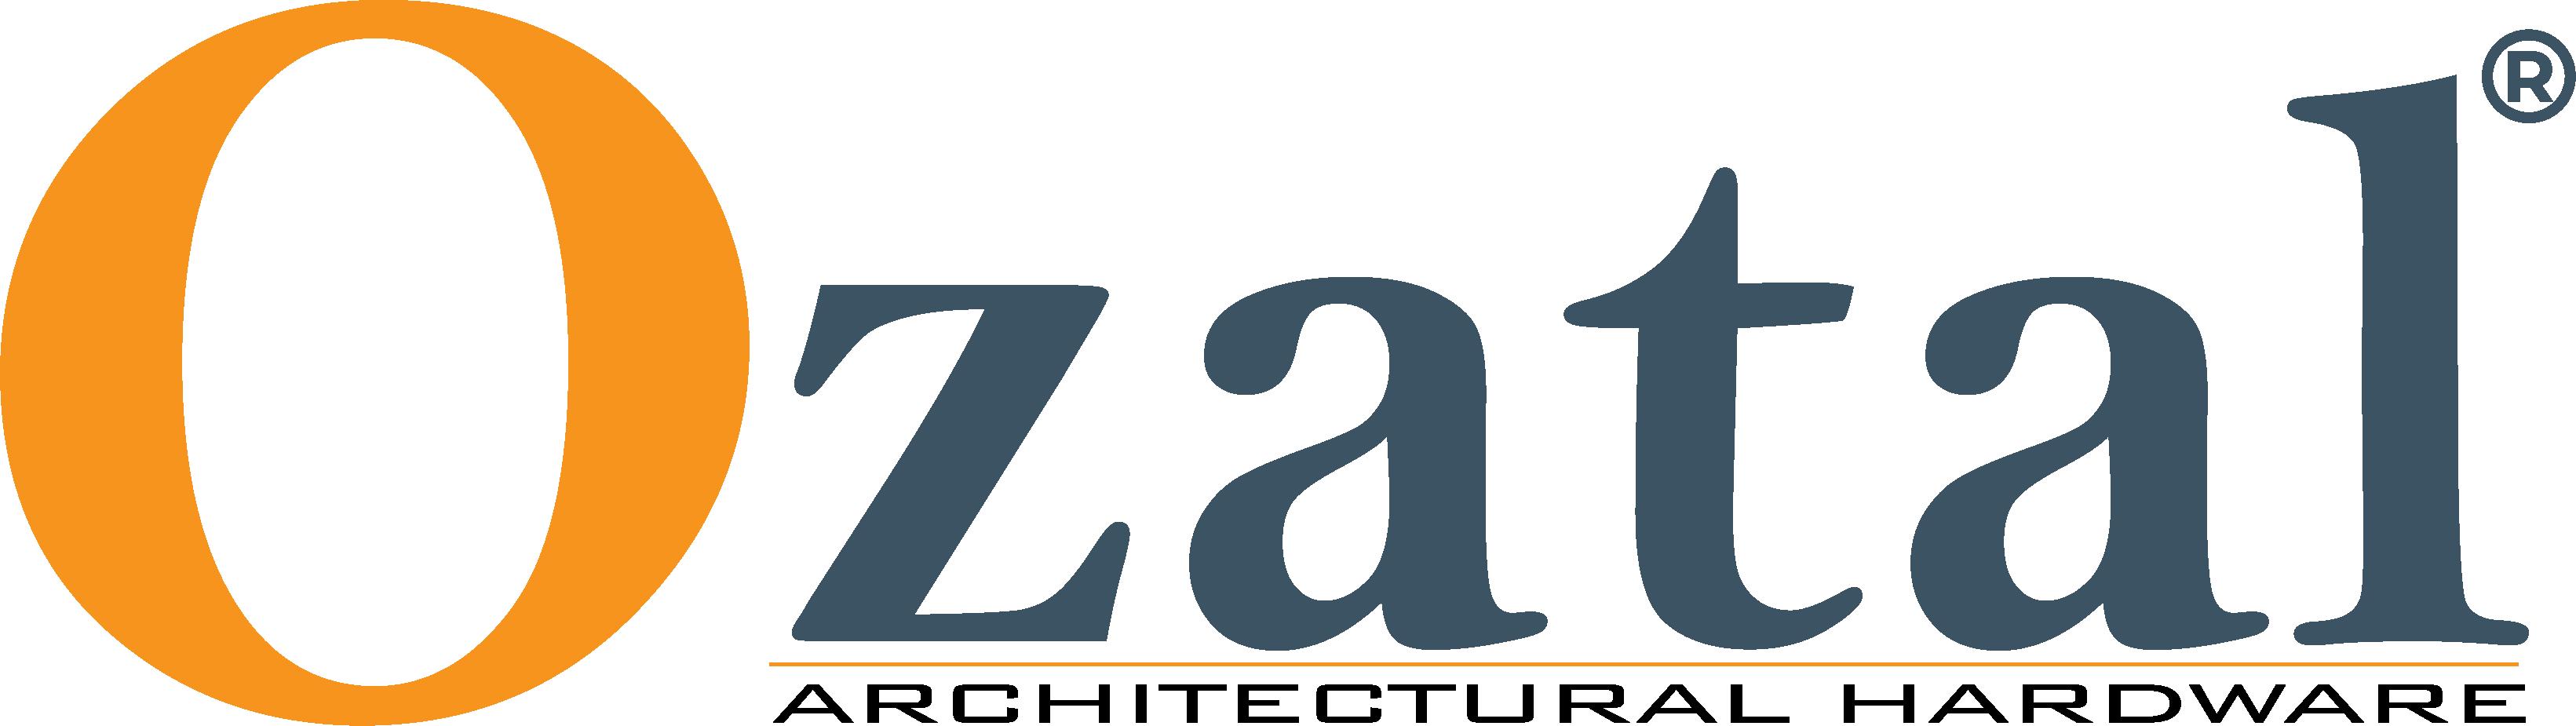 Ozatal Logo